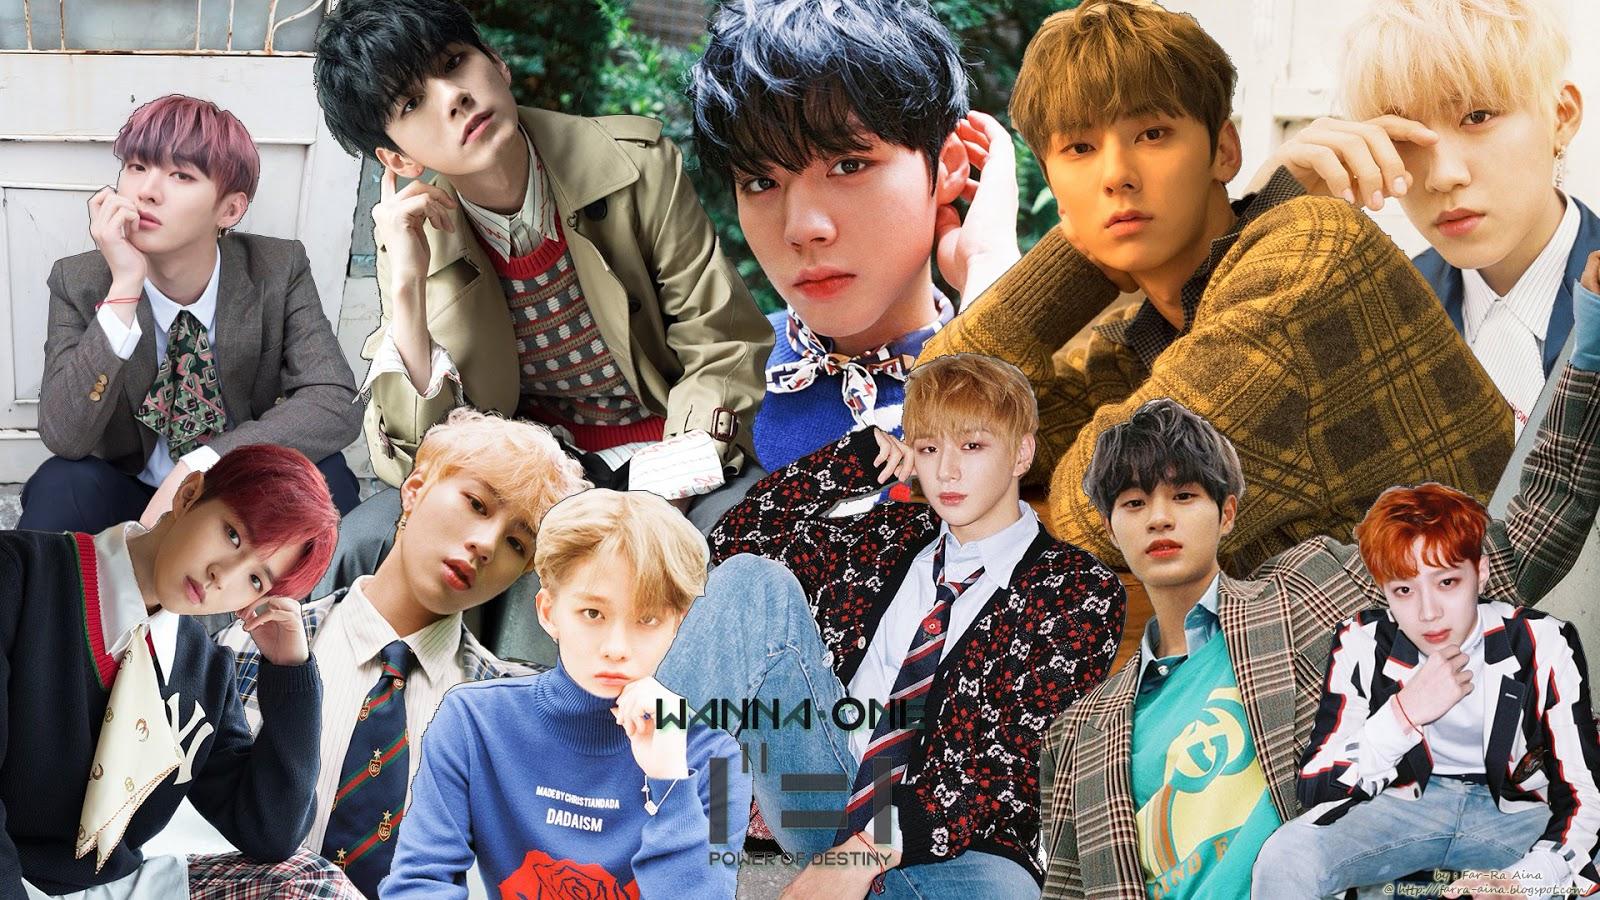 K Pop Lover Wanna One 1 1 Power Of Destiny Wallpaper